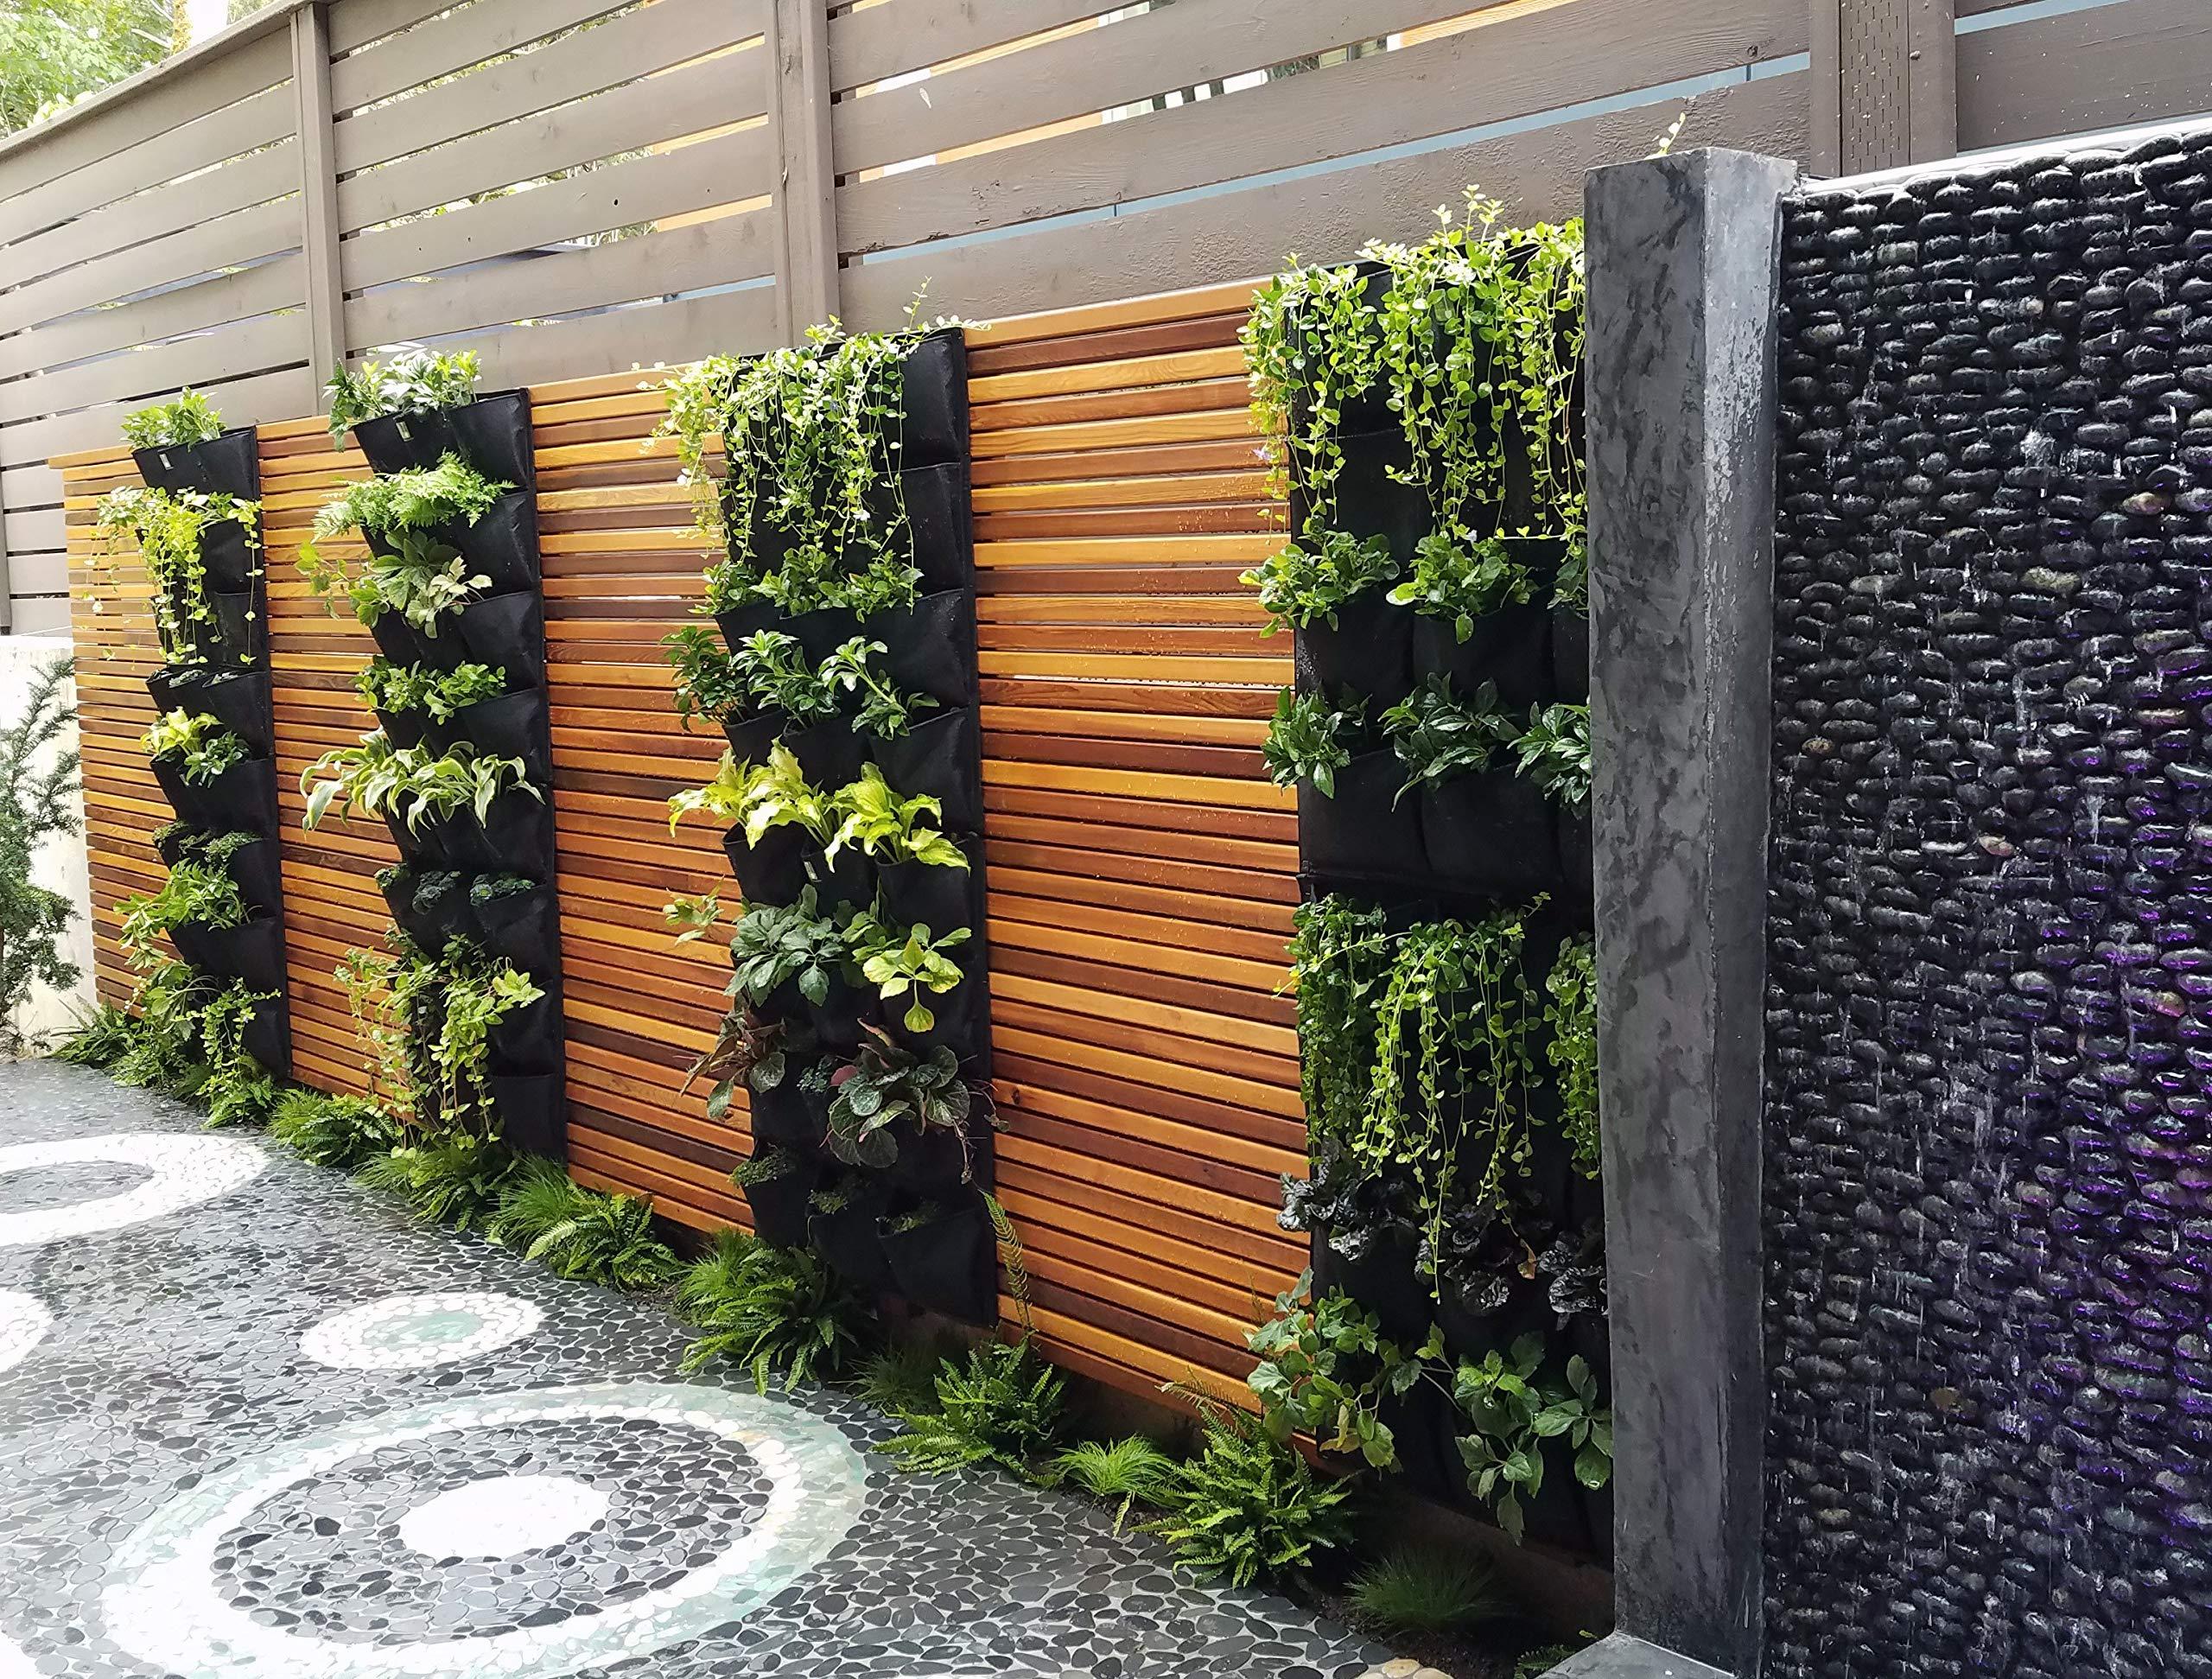 12 Pocket Garden Outdoor Vertical Living Wall Planter by Green-Planter (Image #1)